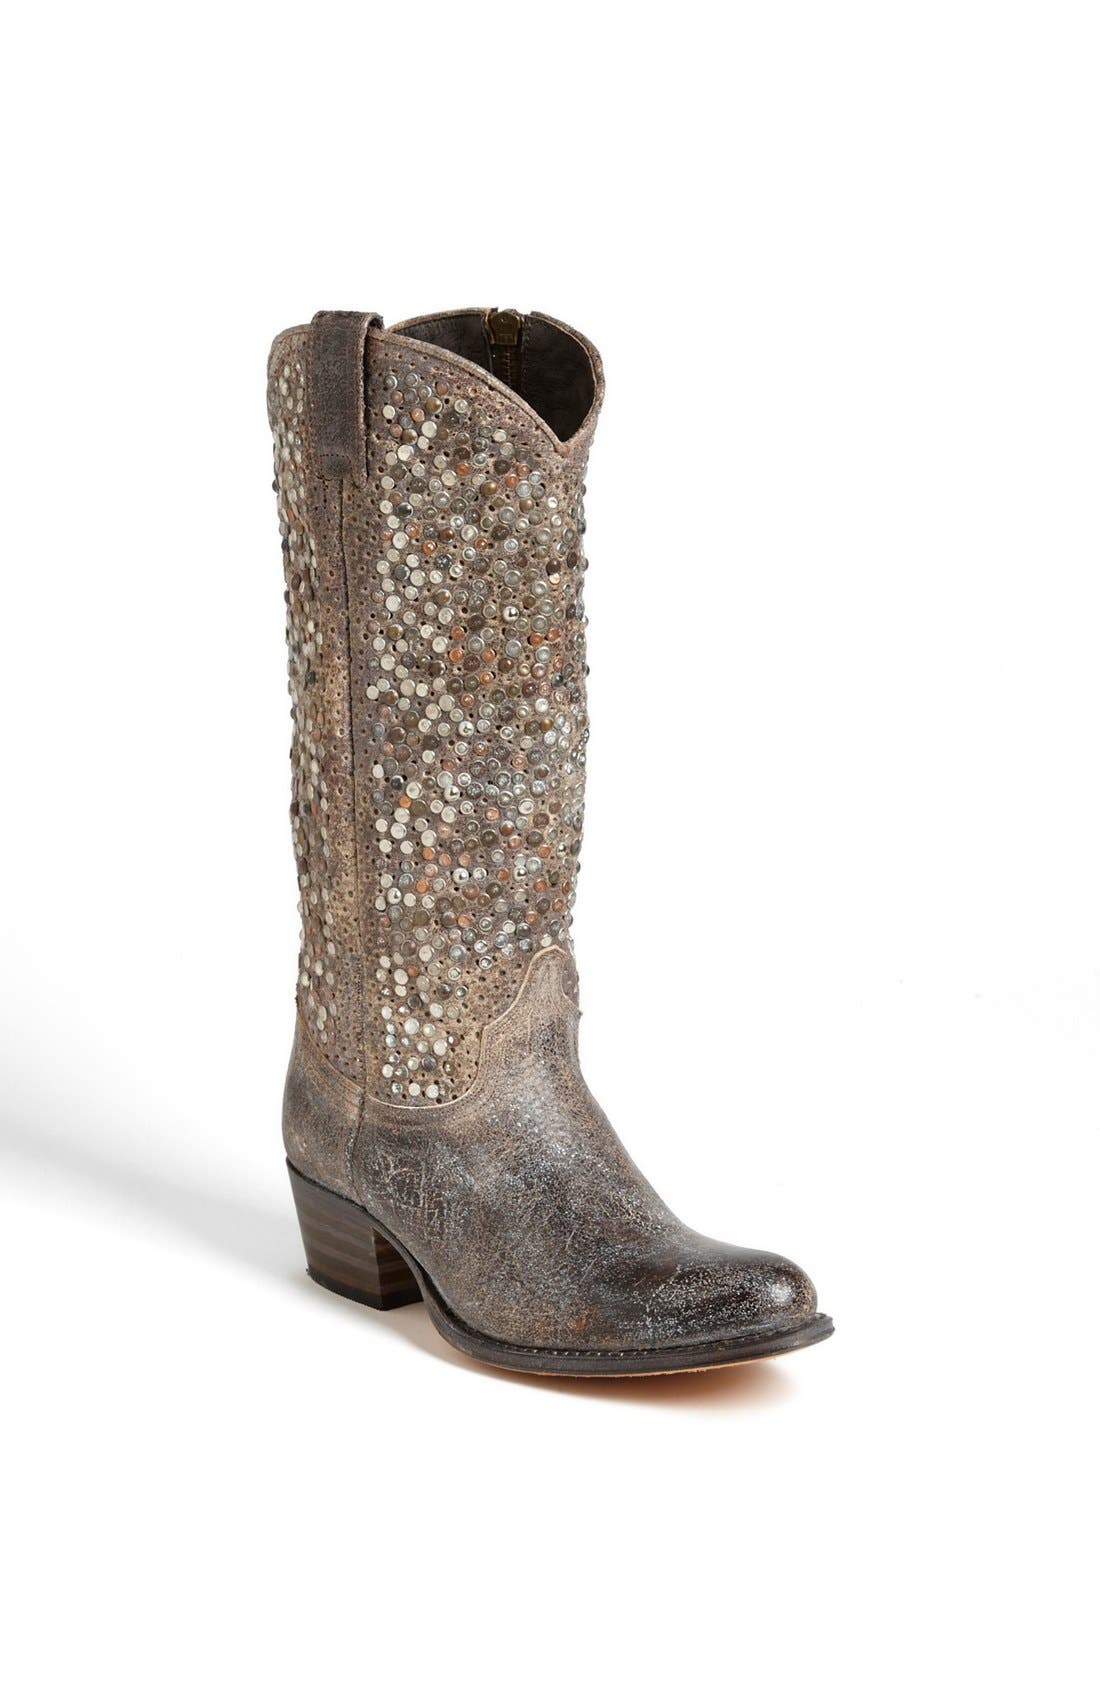 Alternate Image 1 Selected - Frye 'Deborah' Studded Boot